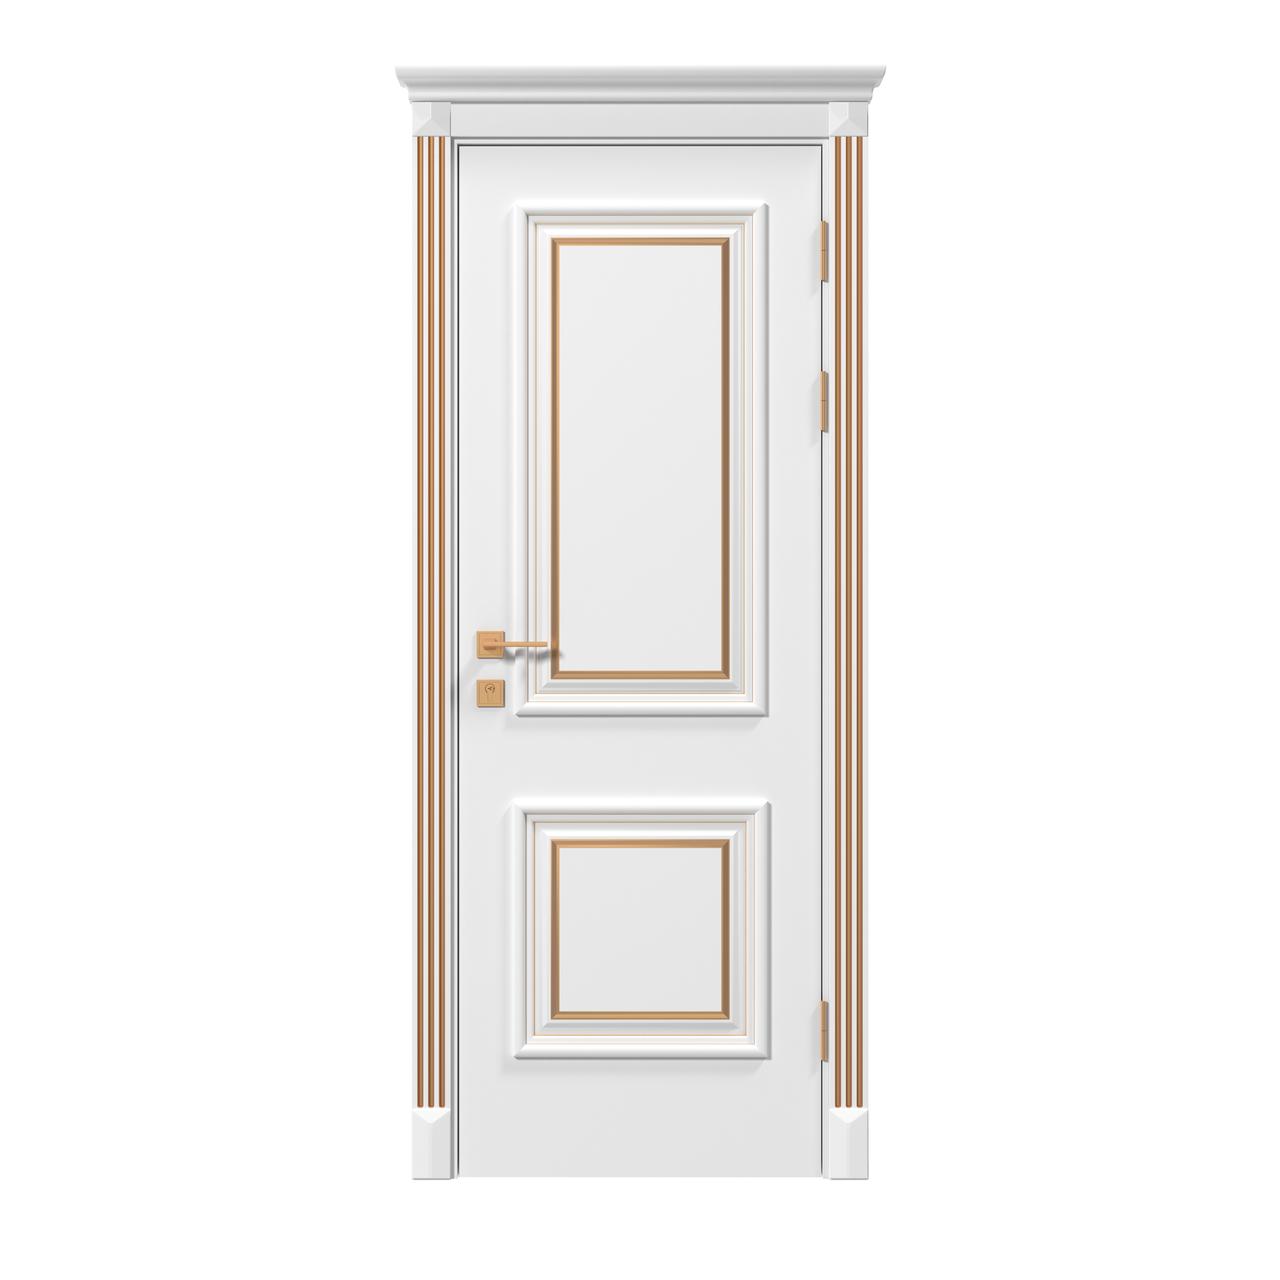 Двери Родос Siena Laura стекло 2, RAL,патина